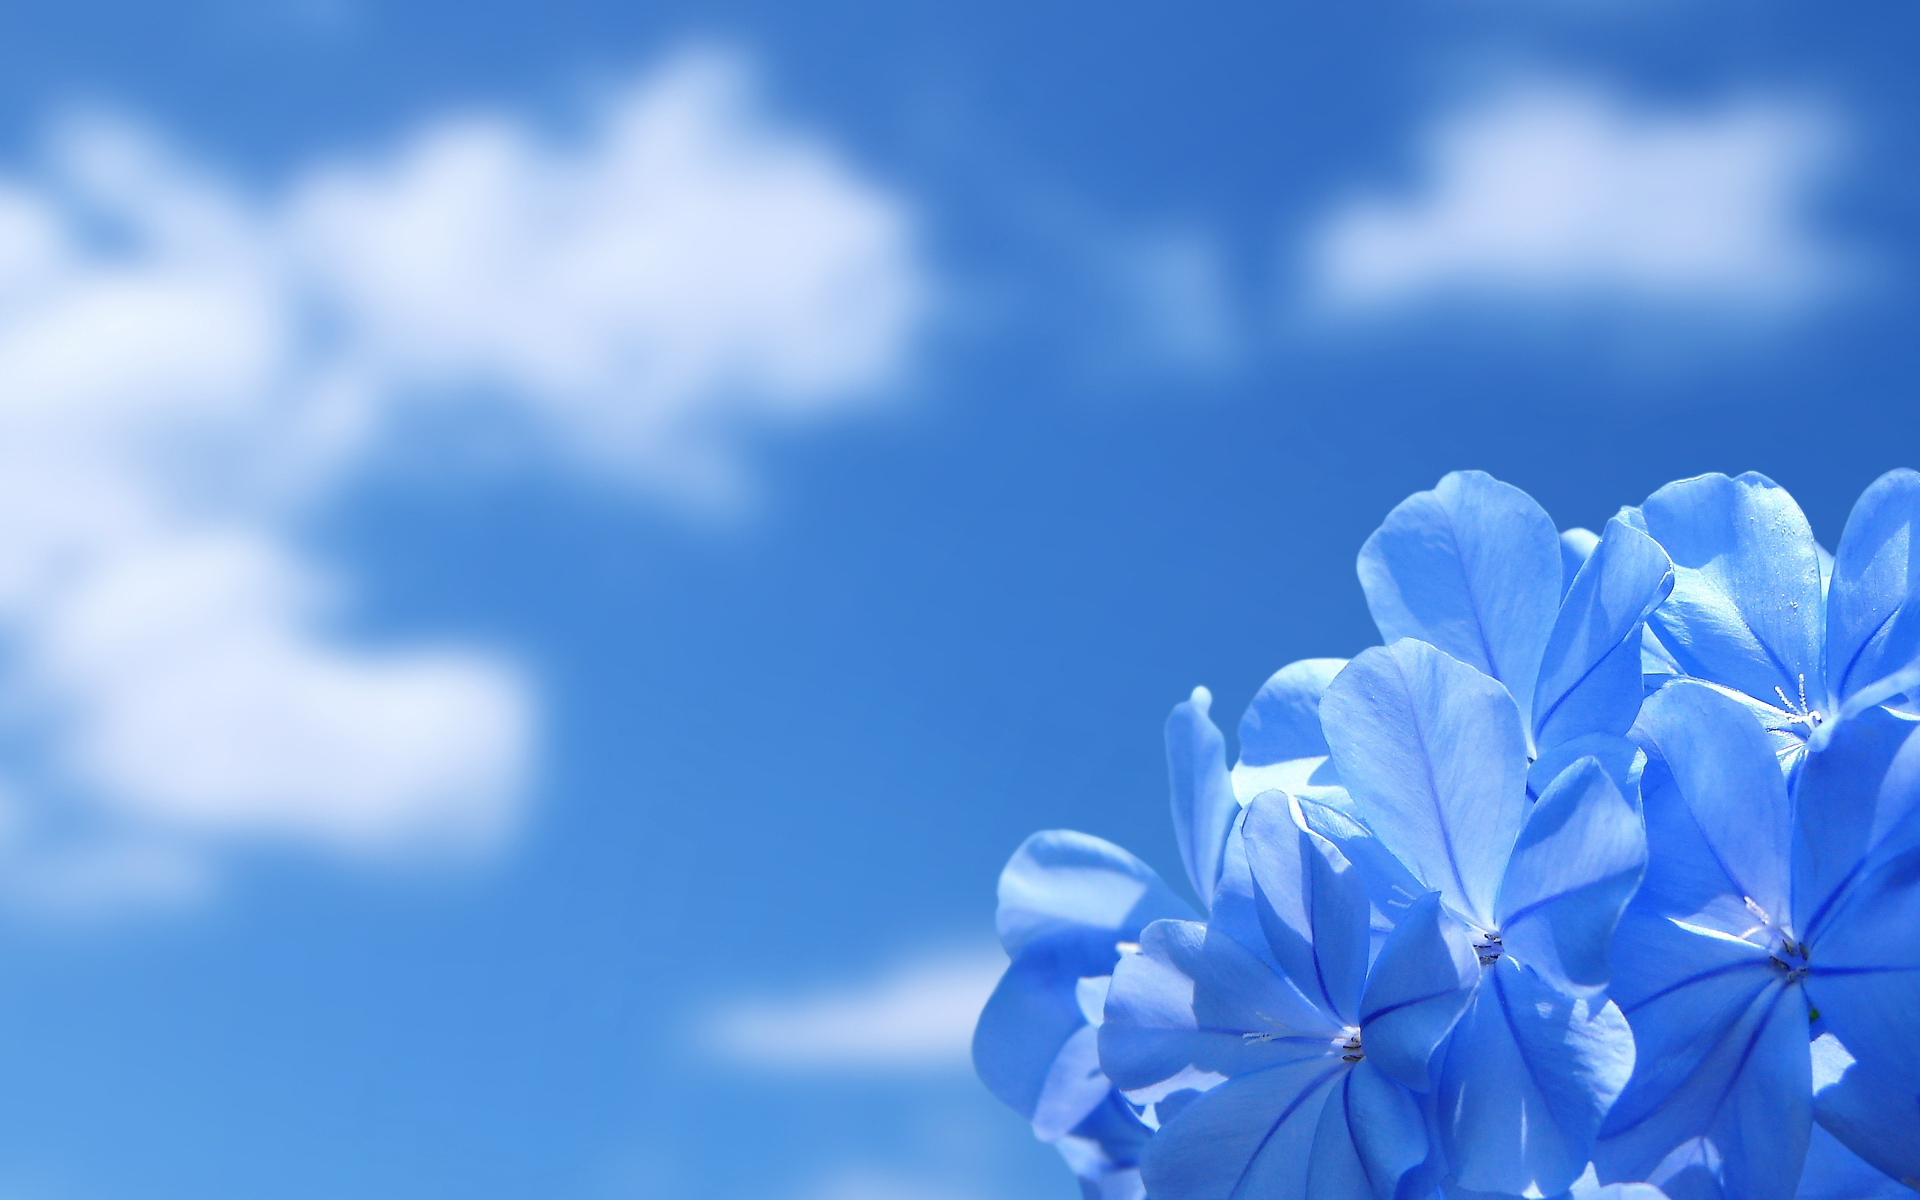 Desktop Backgrounds Flowers Blue Flower wallpapers HD   204729 1920x1200